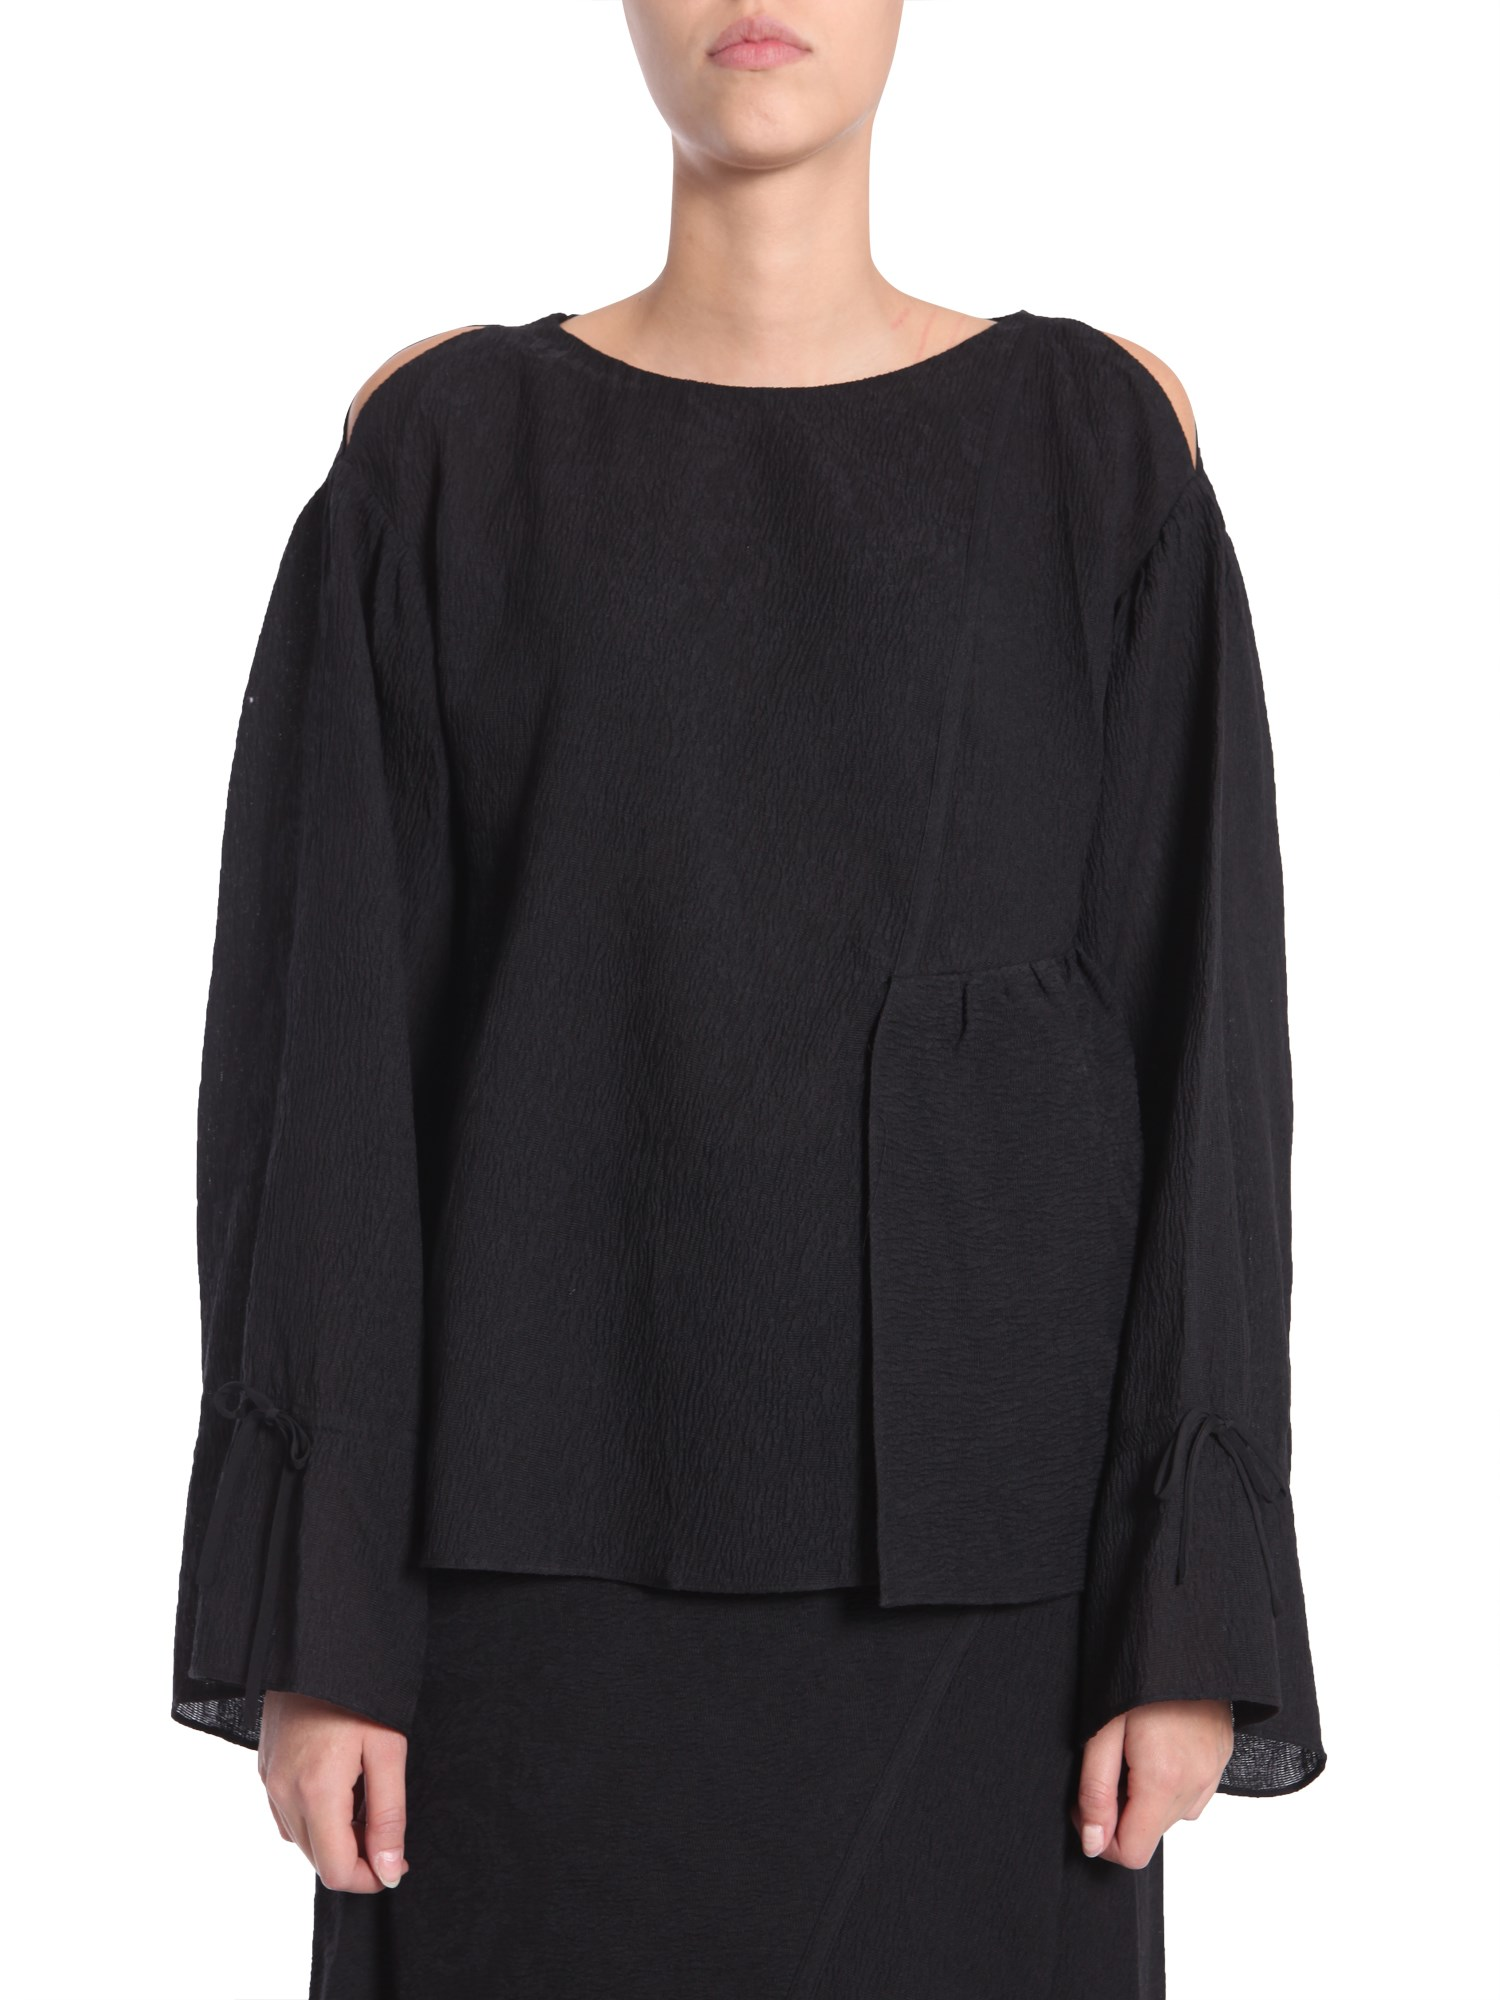 Phillip lim crêpe blouse - 3.1 phillip lim - Modalova